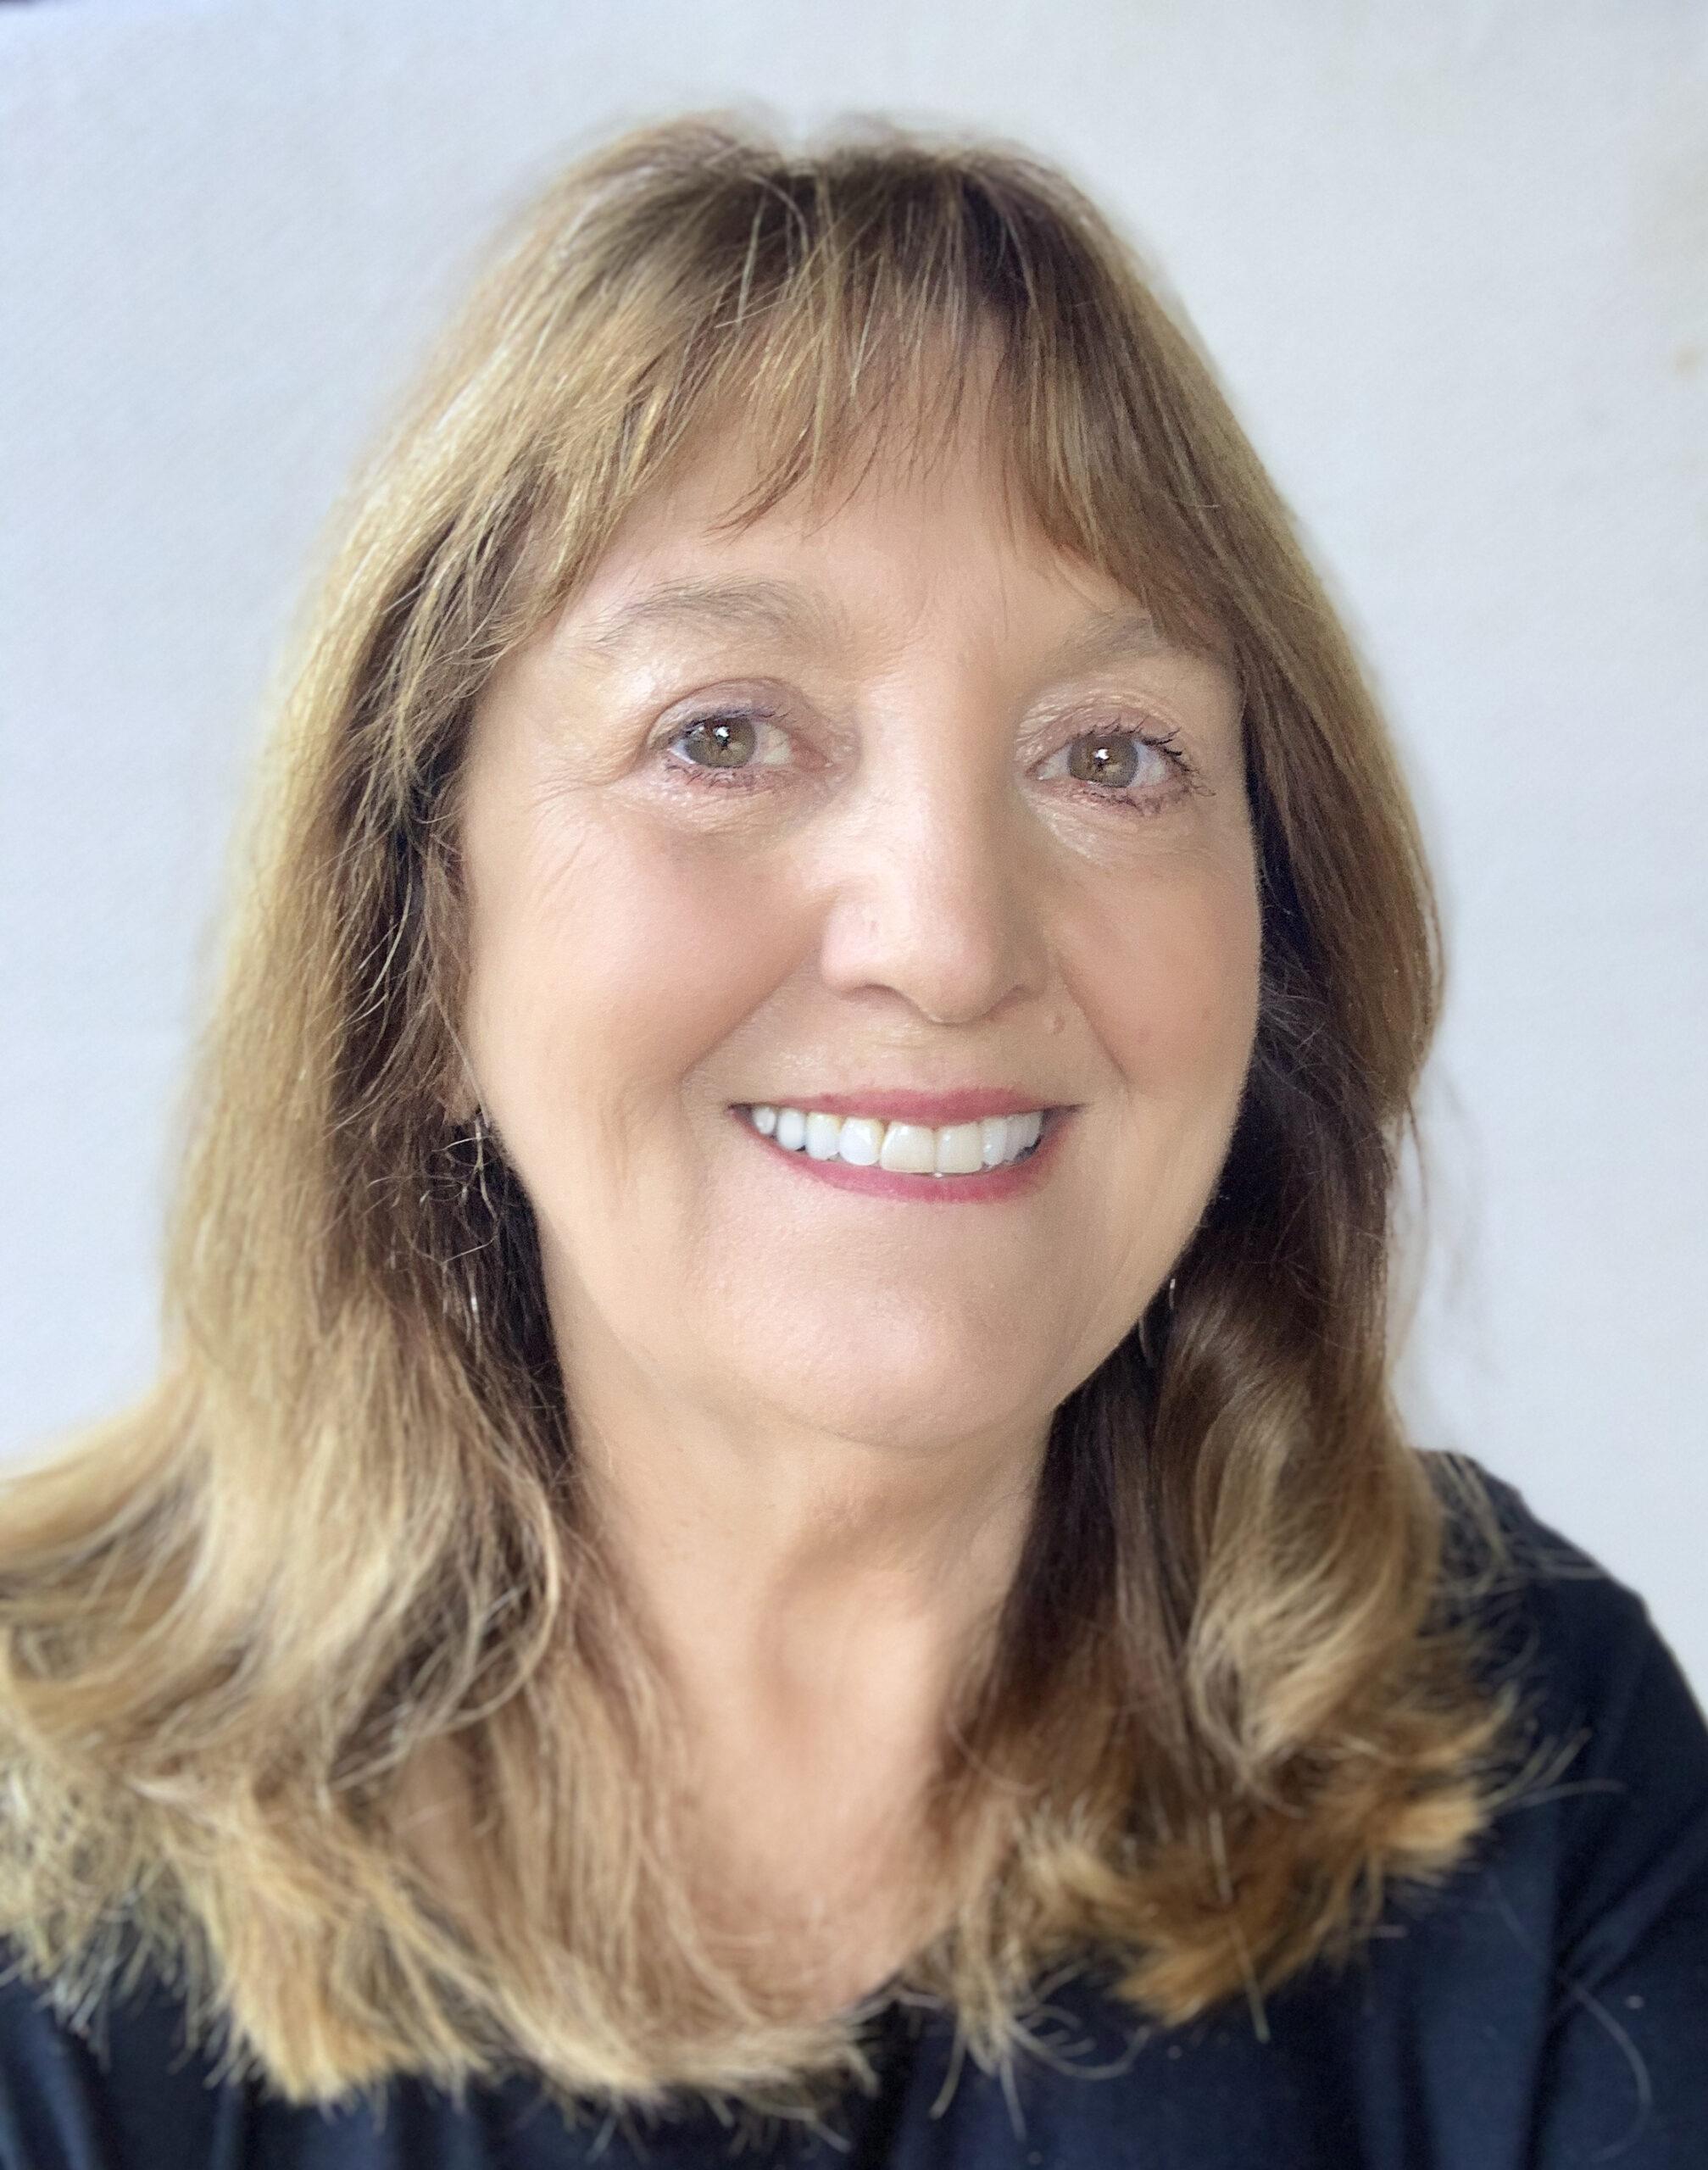 Linda Summersea, July 25, 2020